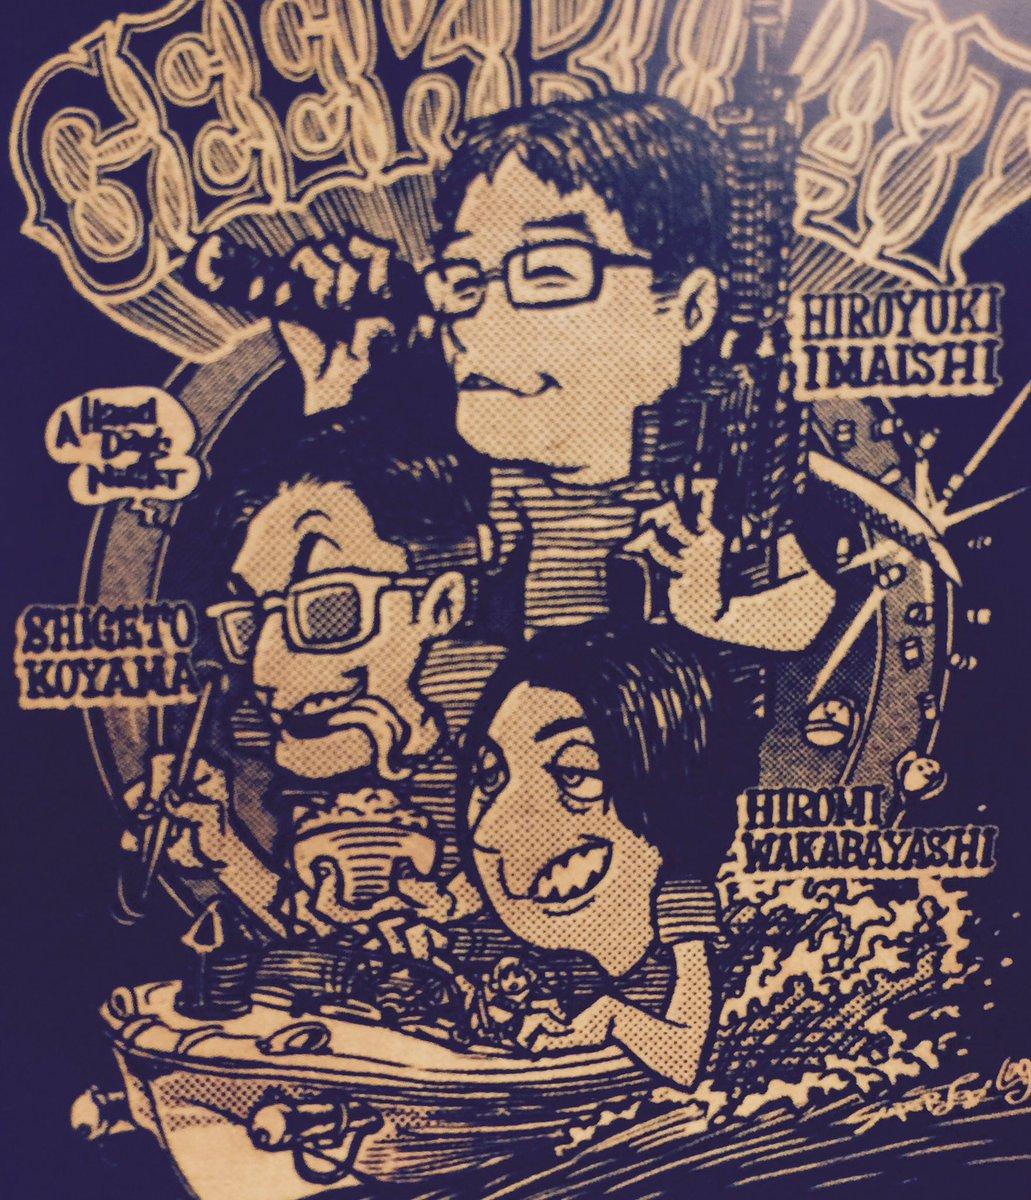 Drawing of three men (labeled Hiroyuki Imaishi, Shigeto Koyama, and Hiromi Wakabayashi) in a small boat. Imaishi is holding a katana and a gun. Koyama is holding a pen.